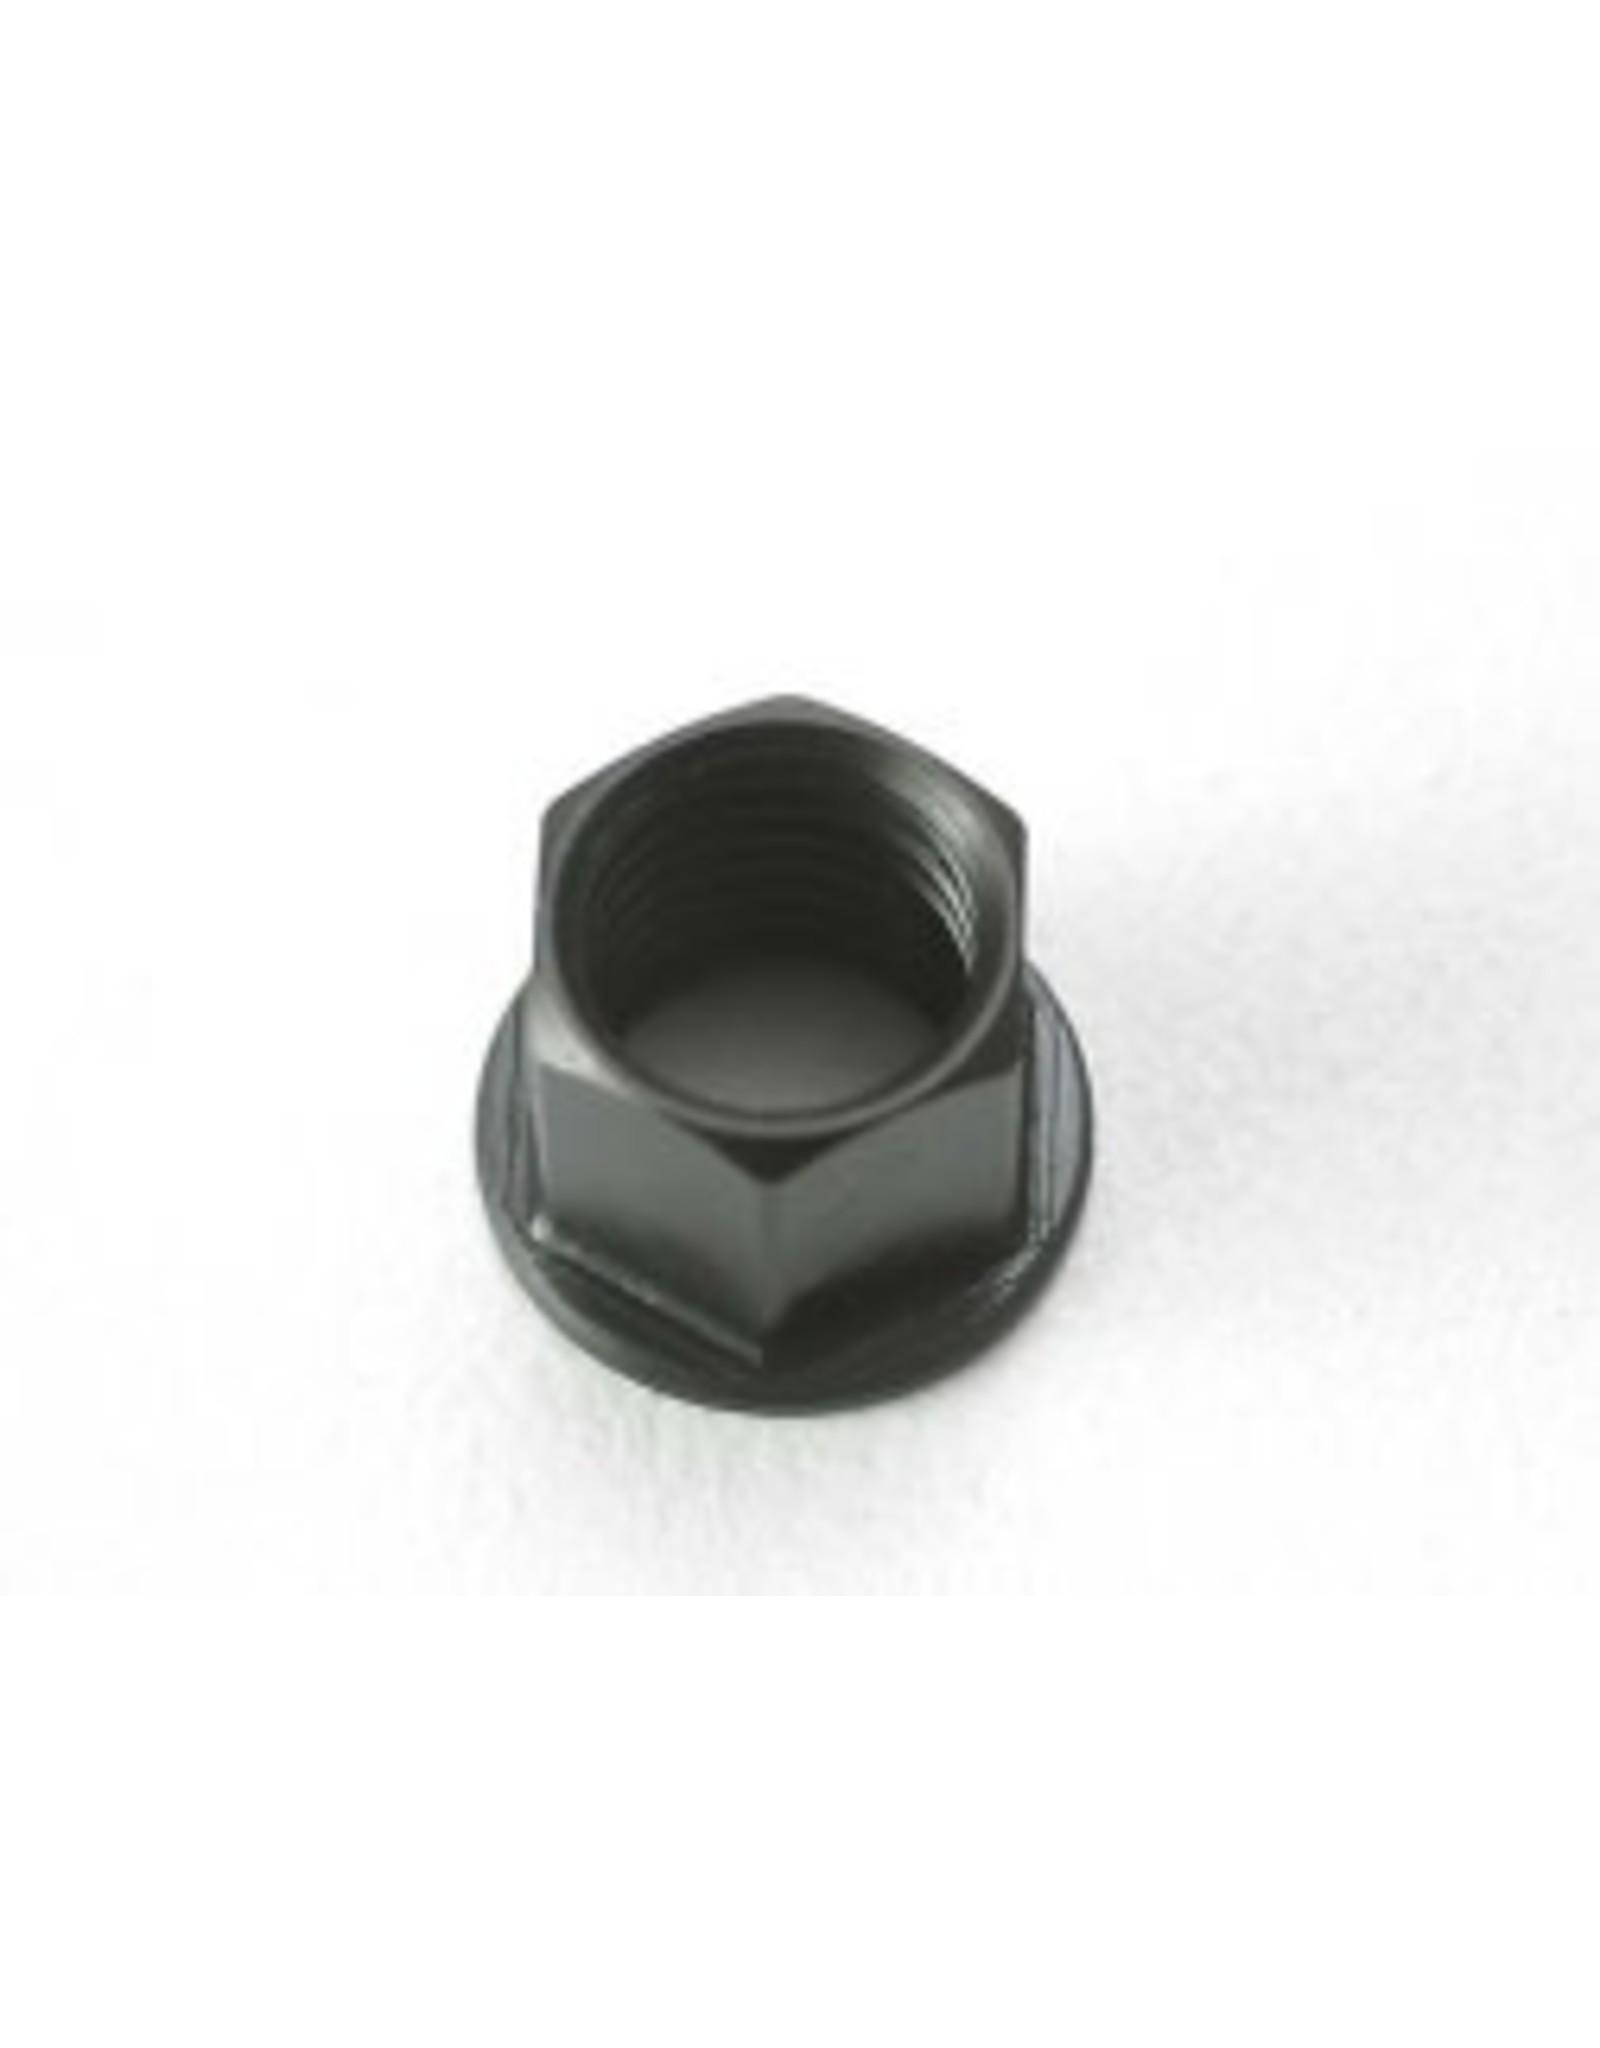 Traxxas Flywheel nut (TRX® 2.5, 2.5R, 3.3)